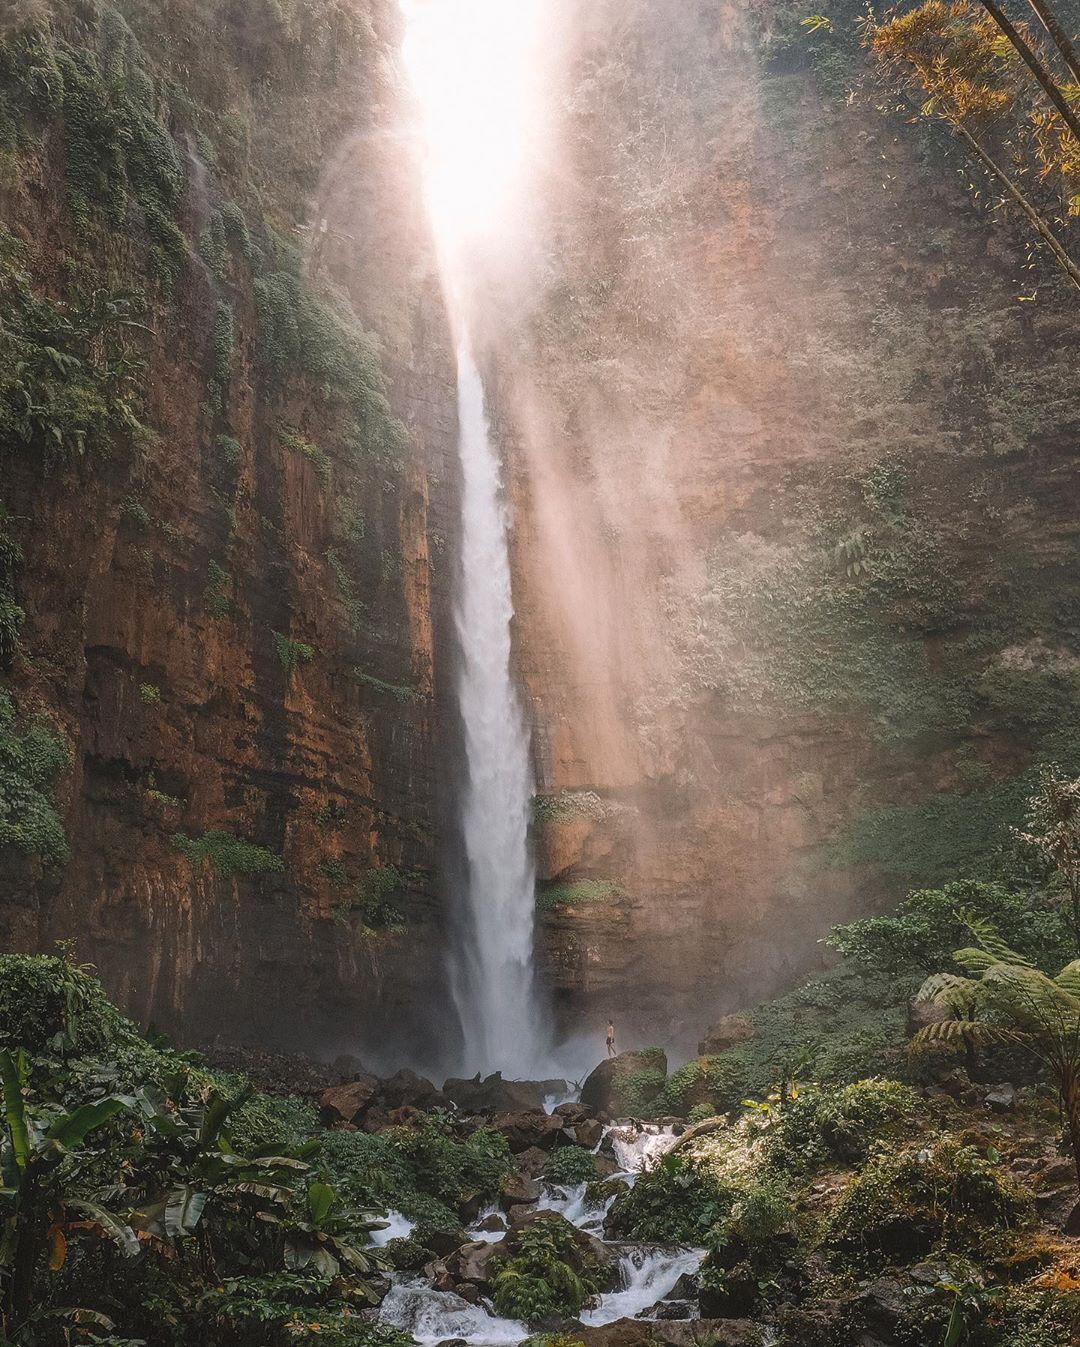 Природа и путешествия на снимках Агуслео Халима